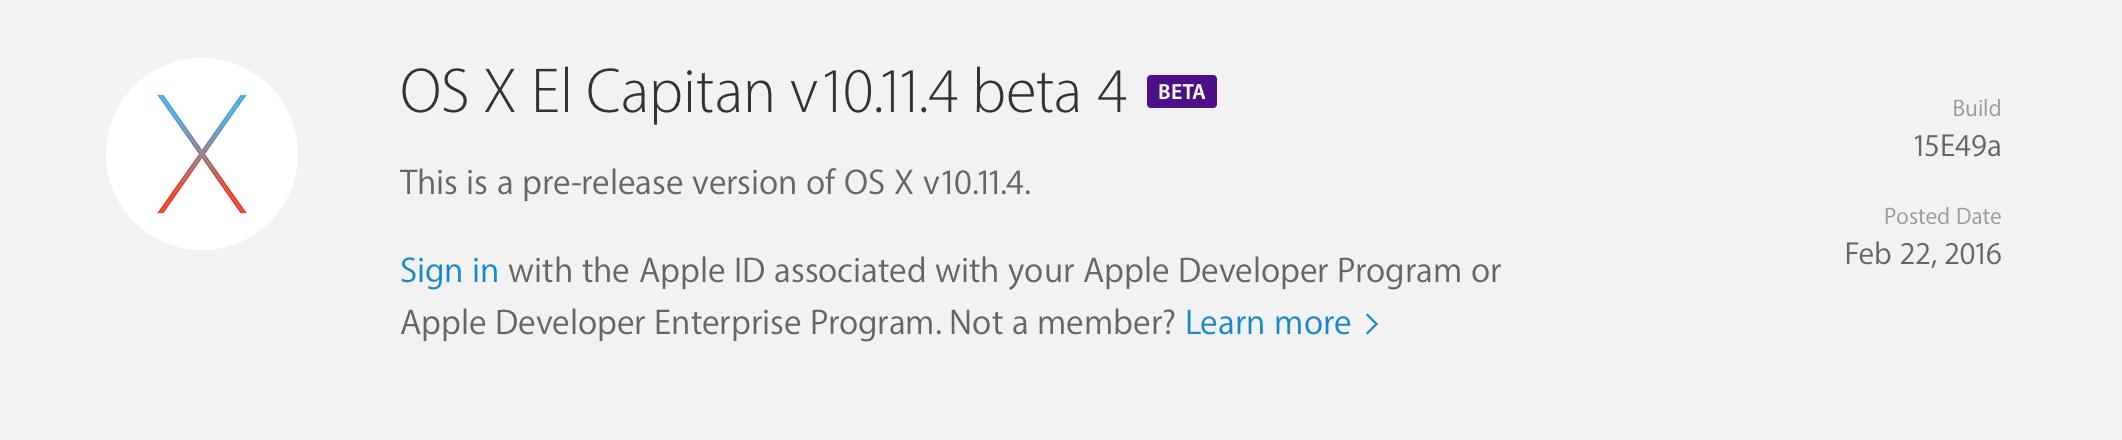 OS X El Capitan v10.11.4 beta 4 개발자에게 공개.